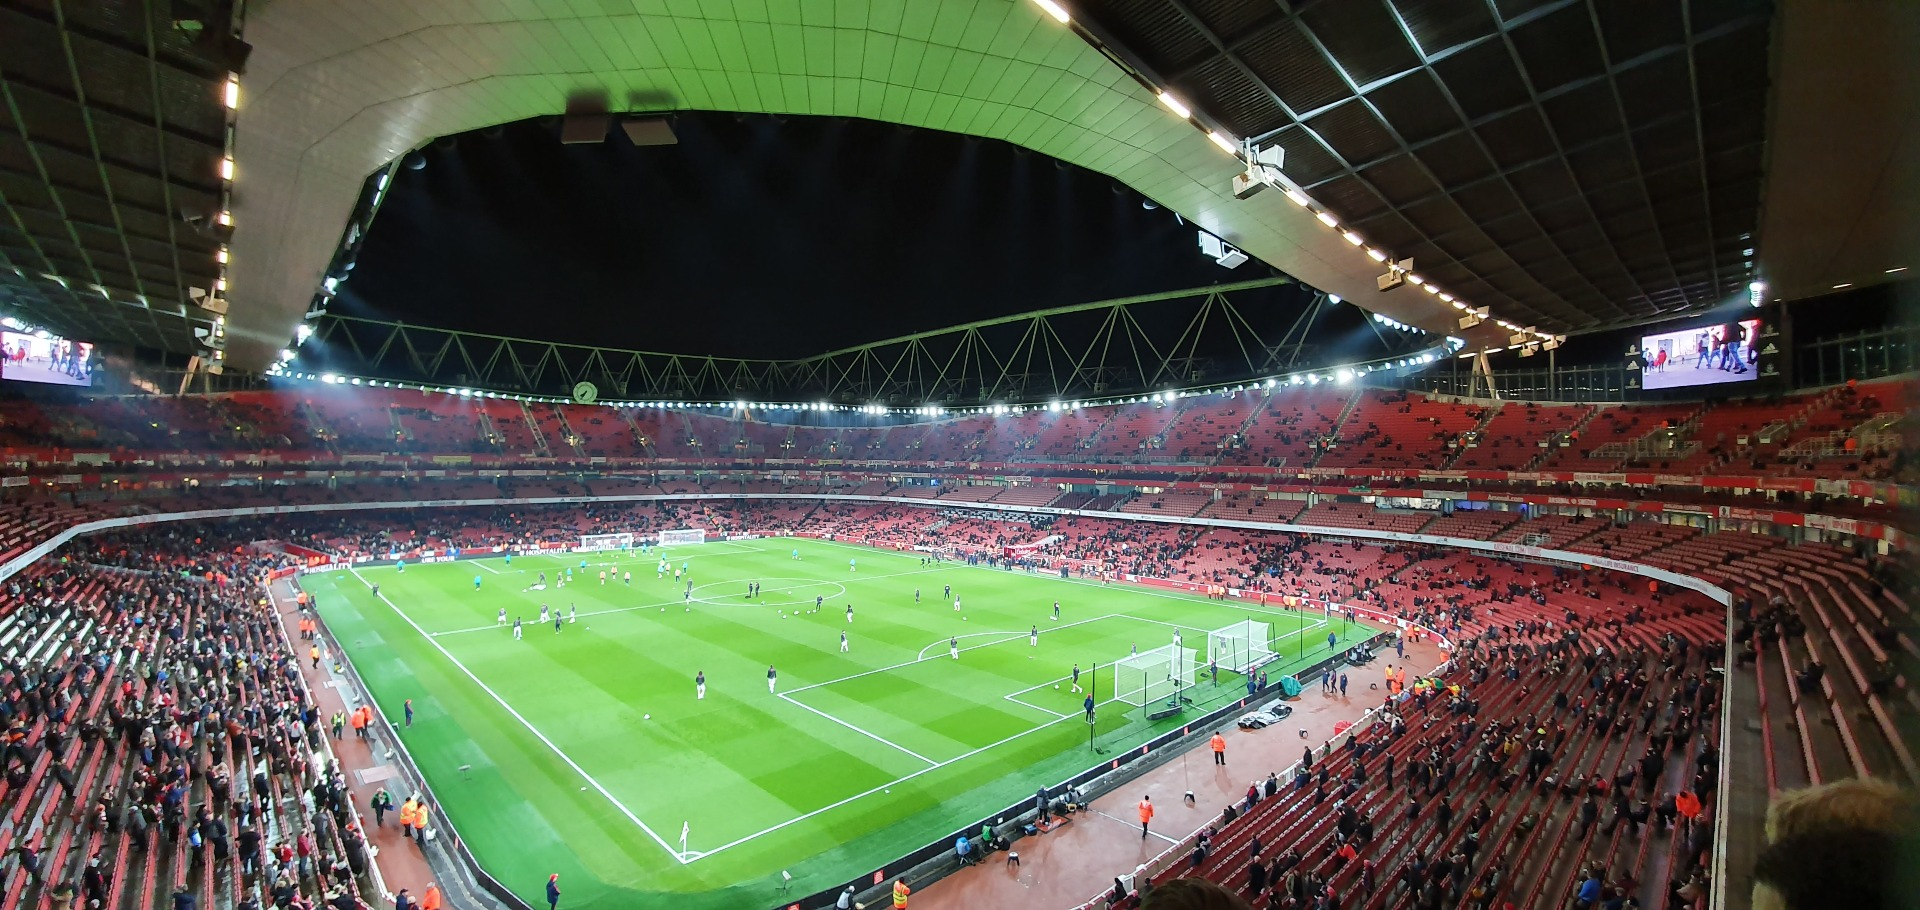 Emirates Stadium Bereich 106 Reihe 2 Platz 417